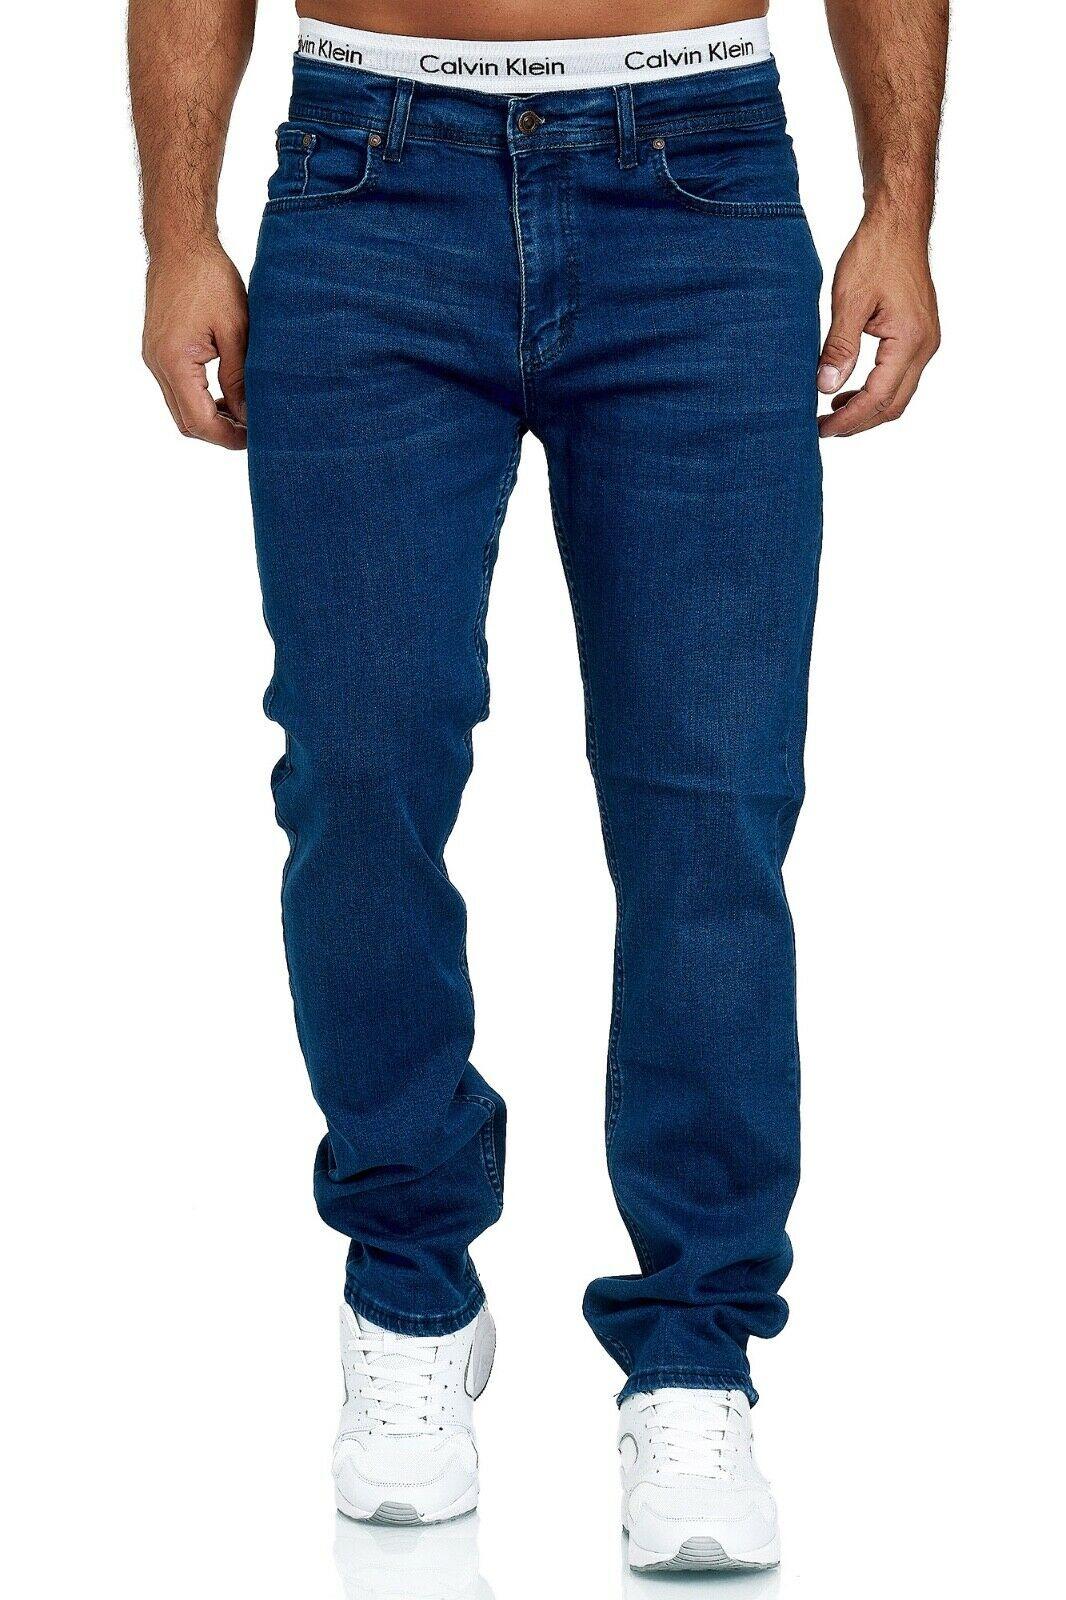 Herren-Jeans-Hose-Denim-KC-Black-Washed-Straight-Cut-Regular-Dicke-Naht-naehte Indexbild 31